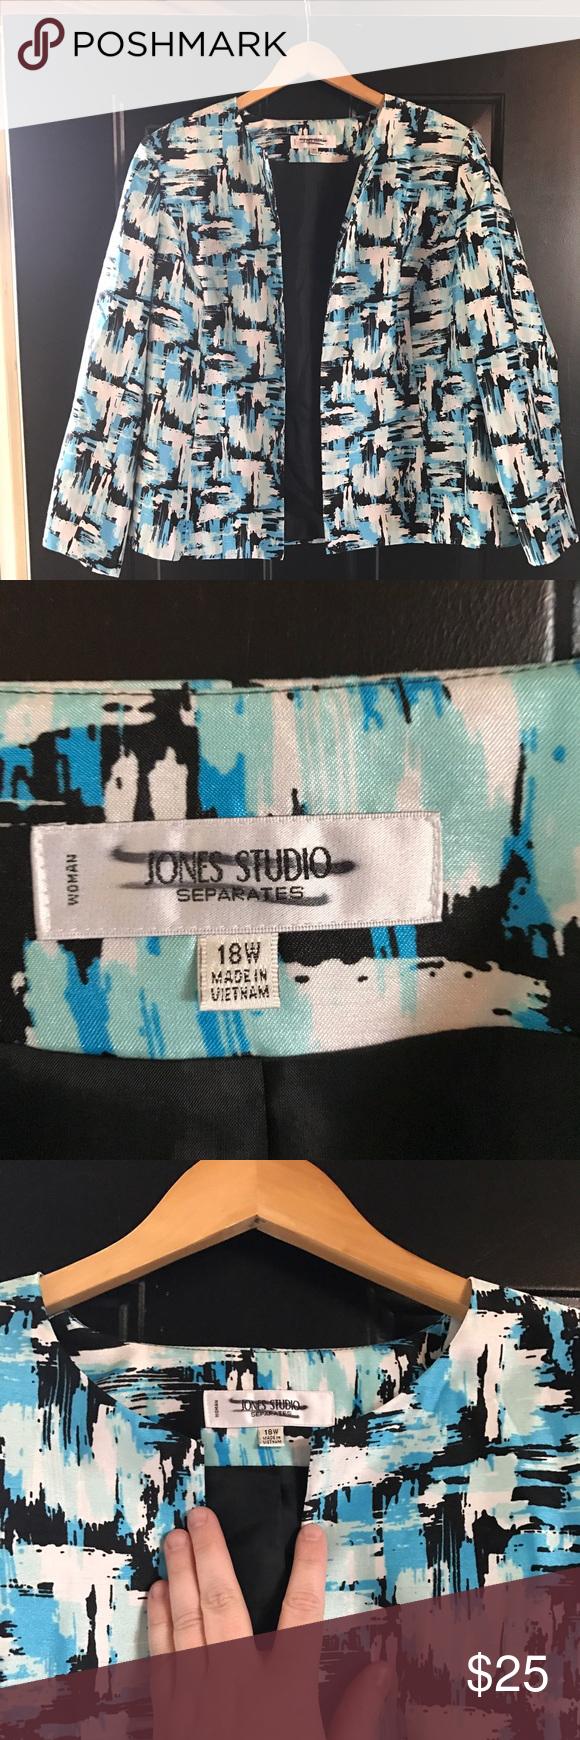 Jones Studio Dress Blazer Blue, black and white print Jones Studio Dress Blazer. Open front, long sleeve, lightweight with shoulder padding (lightly padded). Jones New York Jackets & Coats Blazers